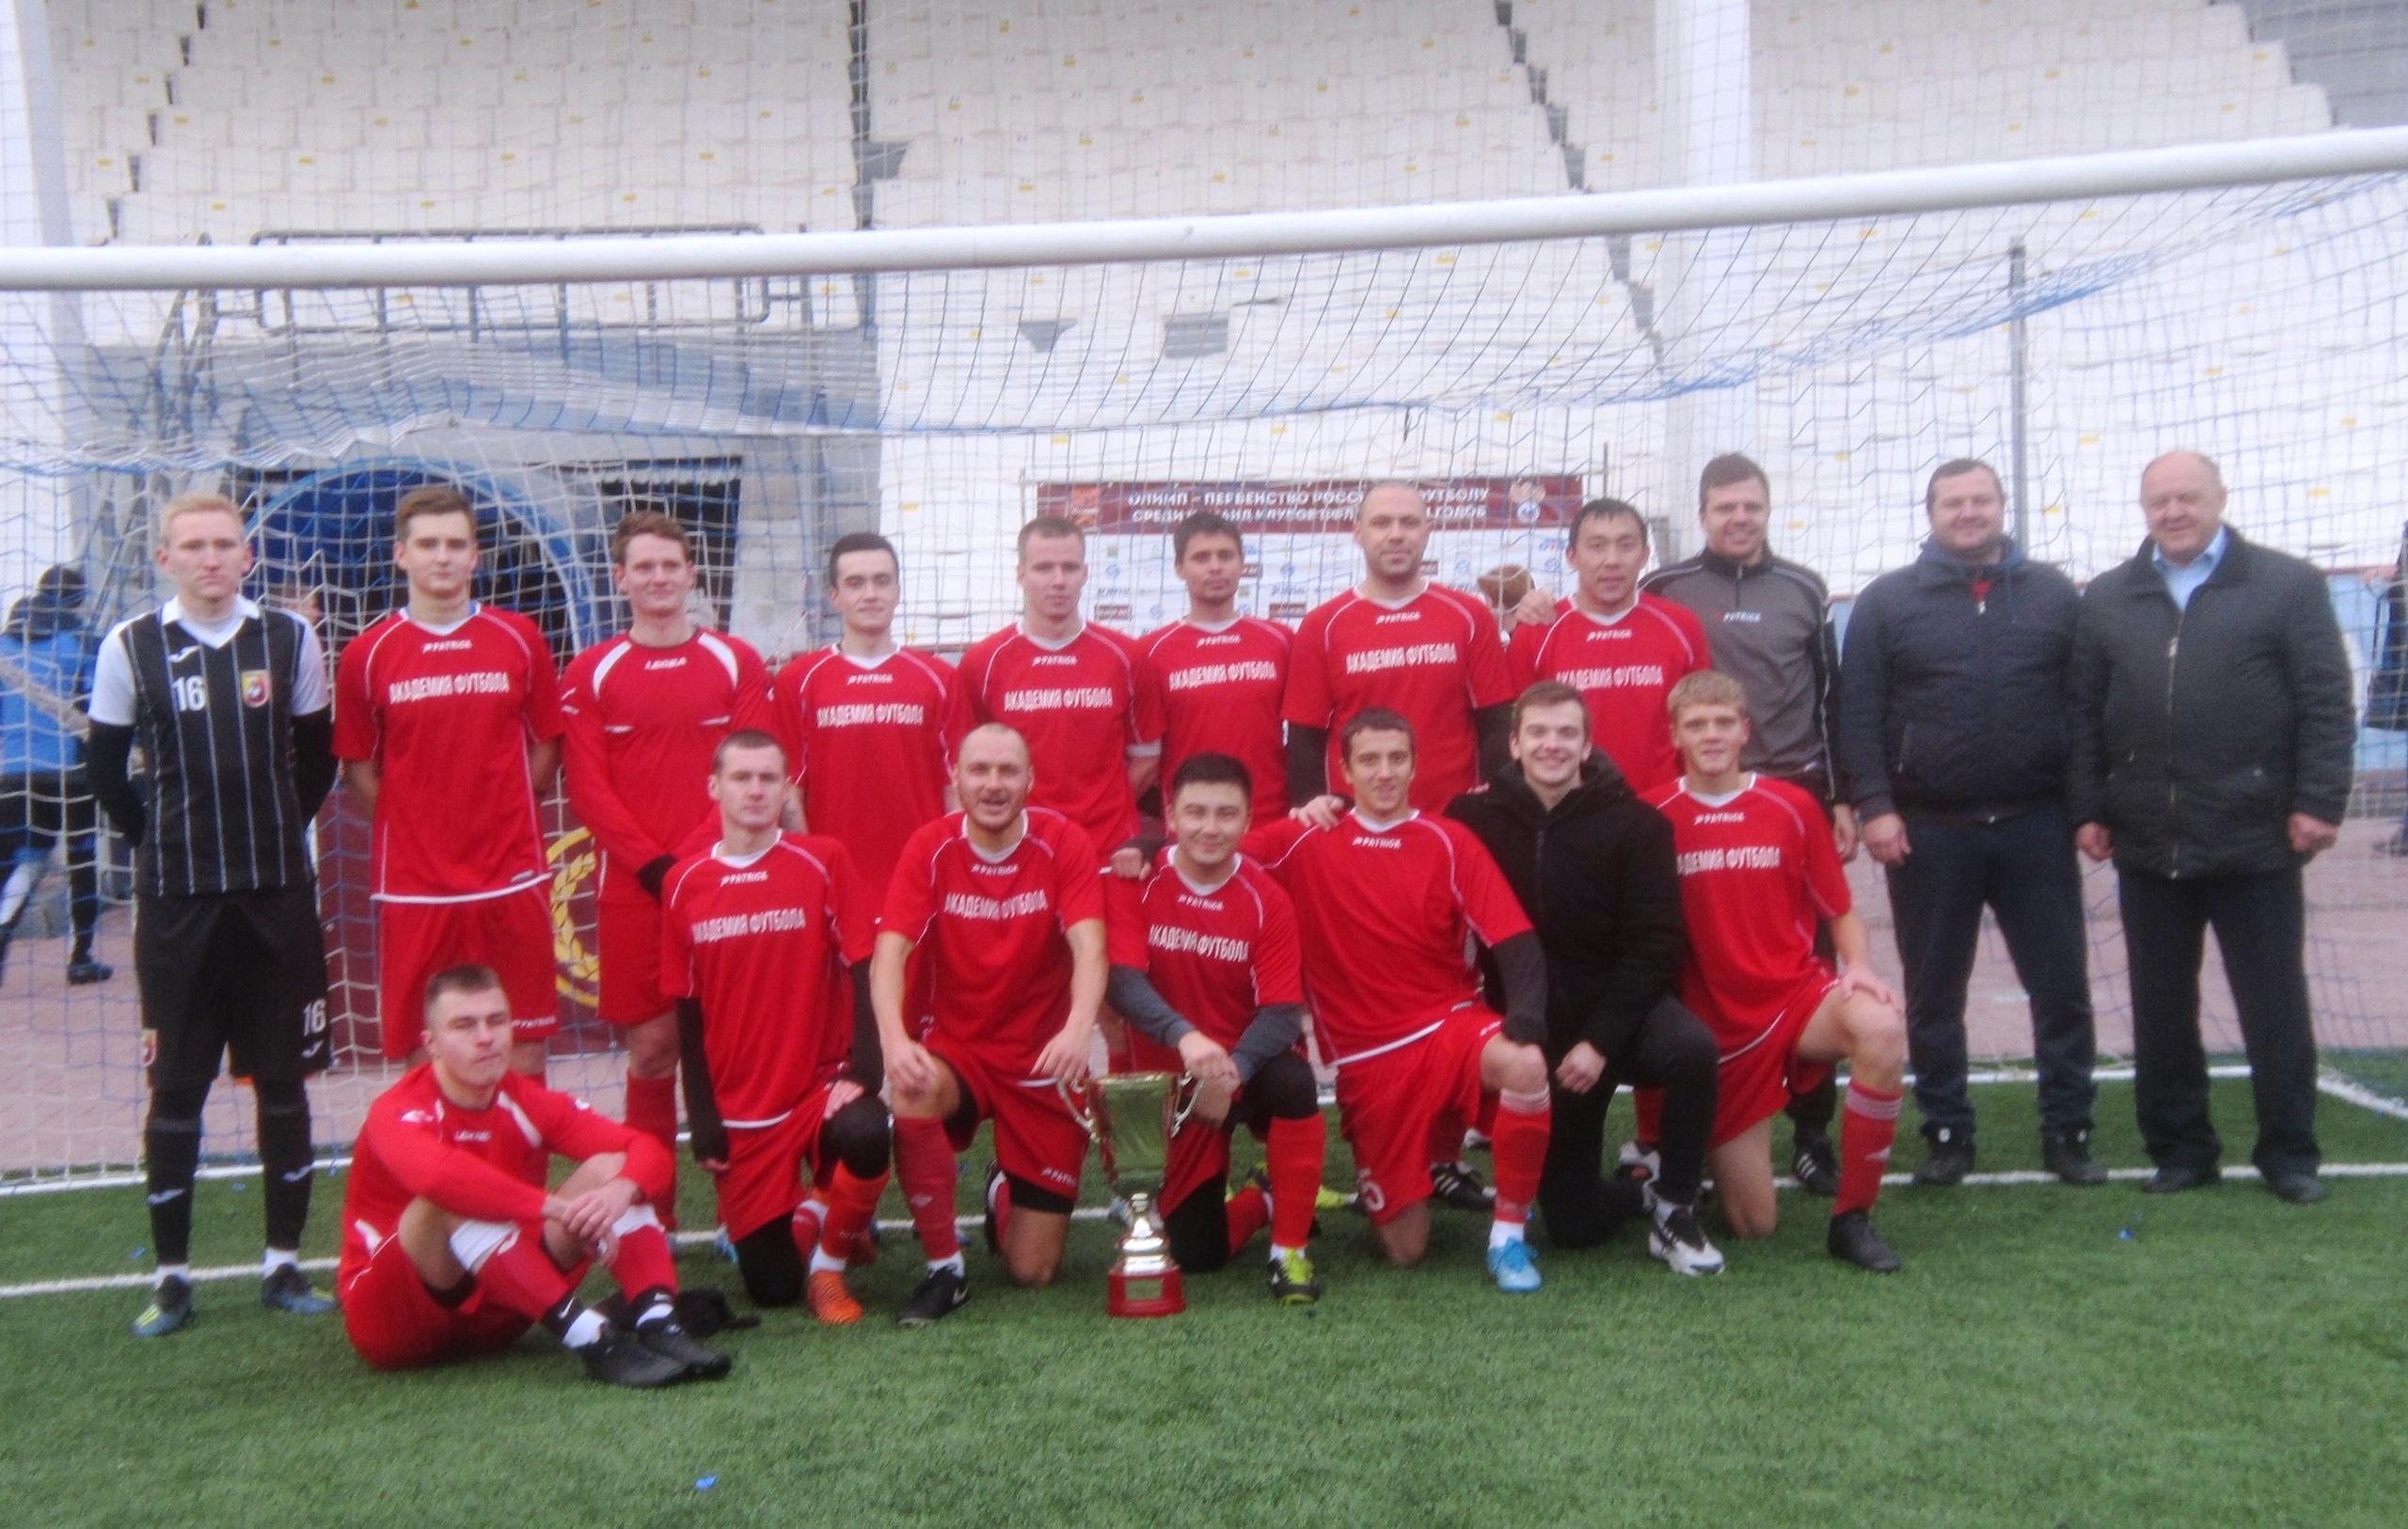 Академия футбола Челябинск 2020